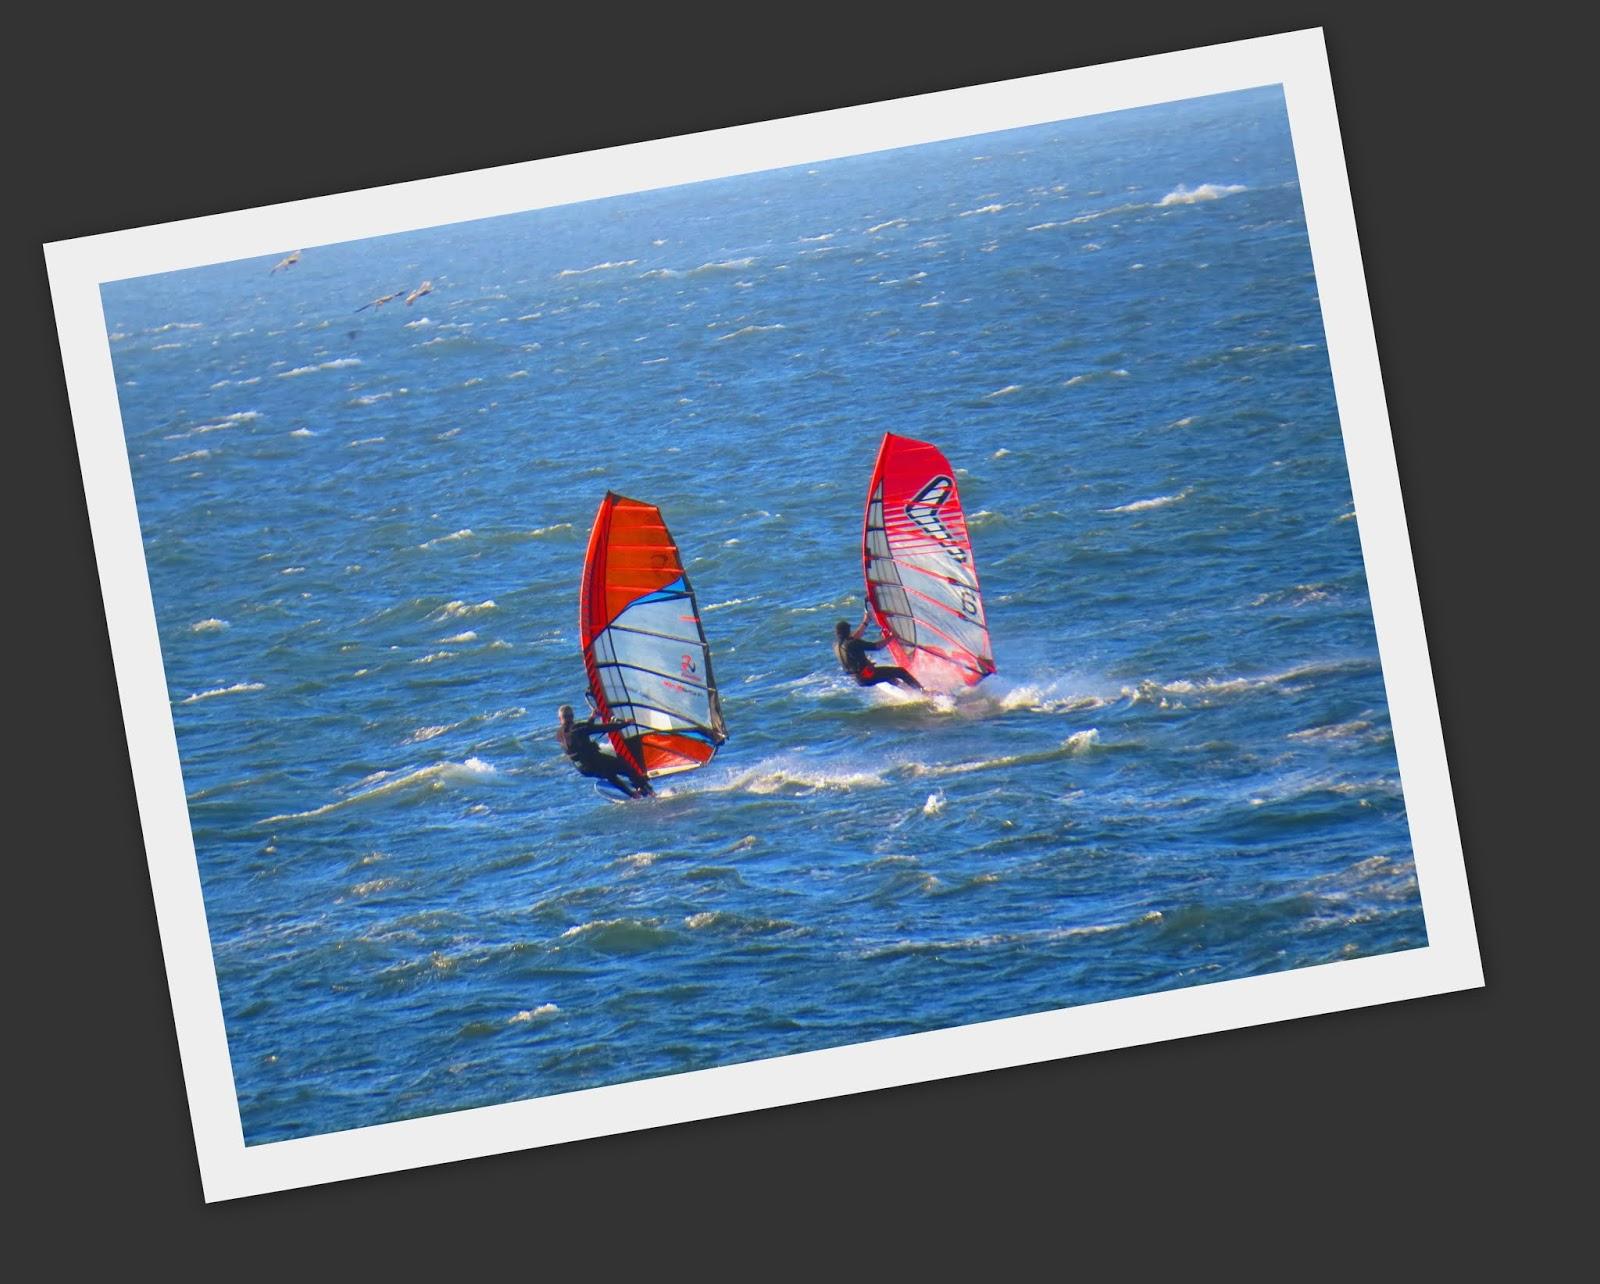 USA 4 Windsurfing Campaign